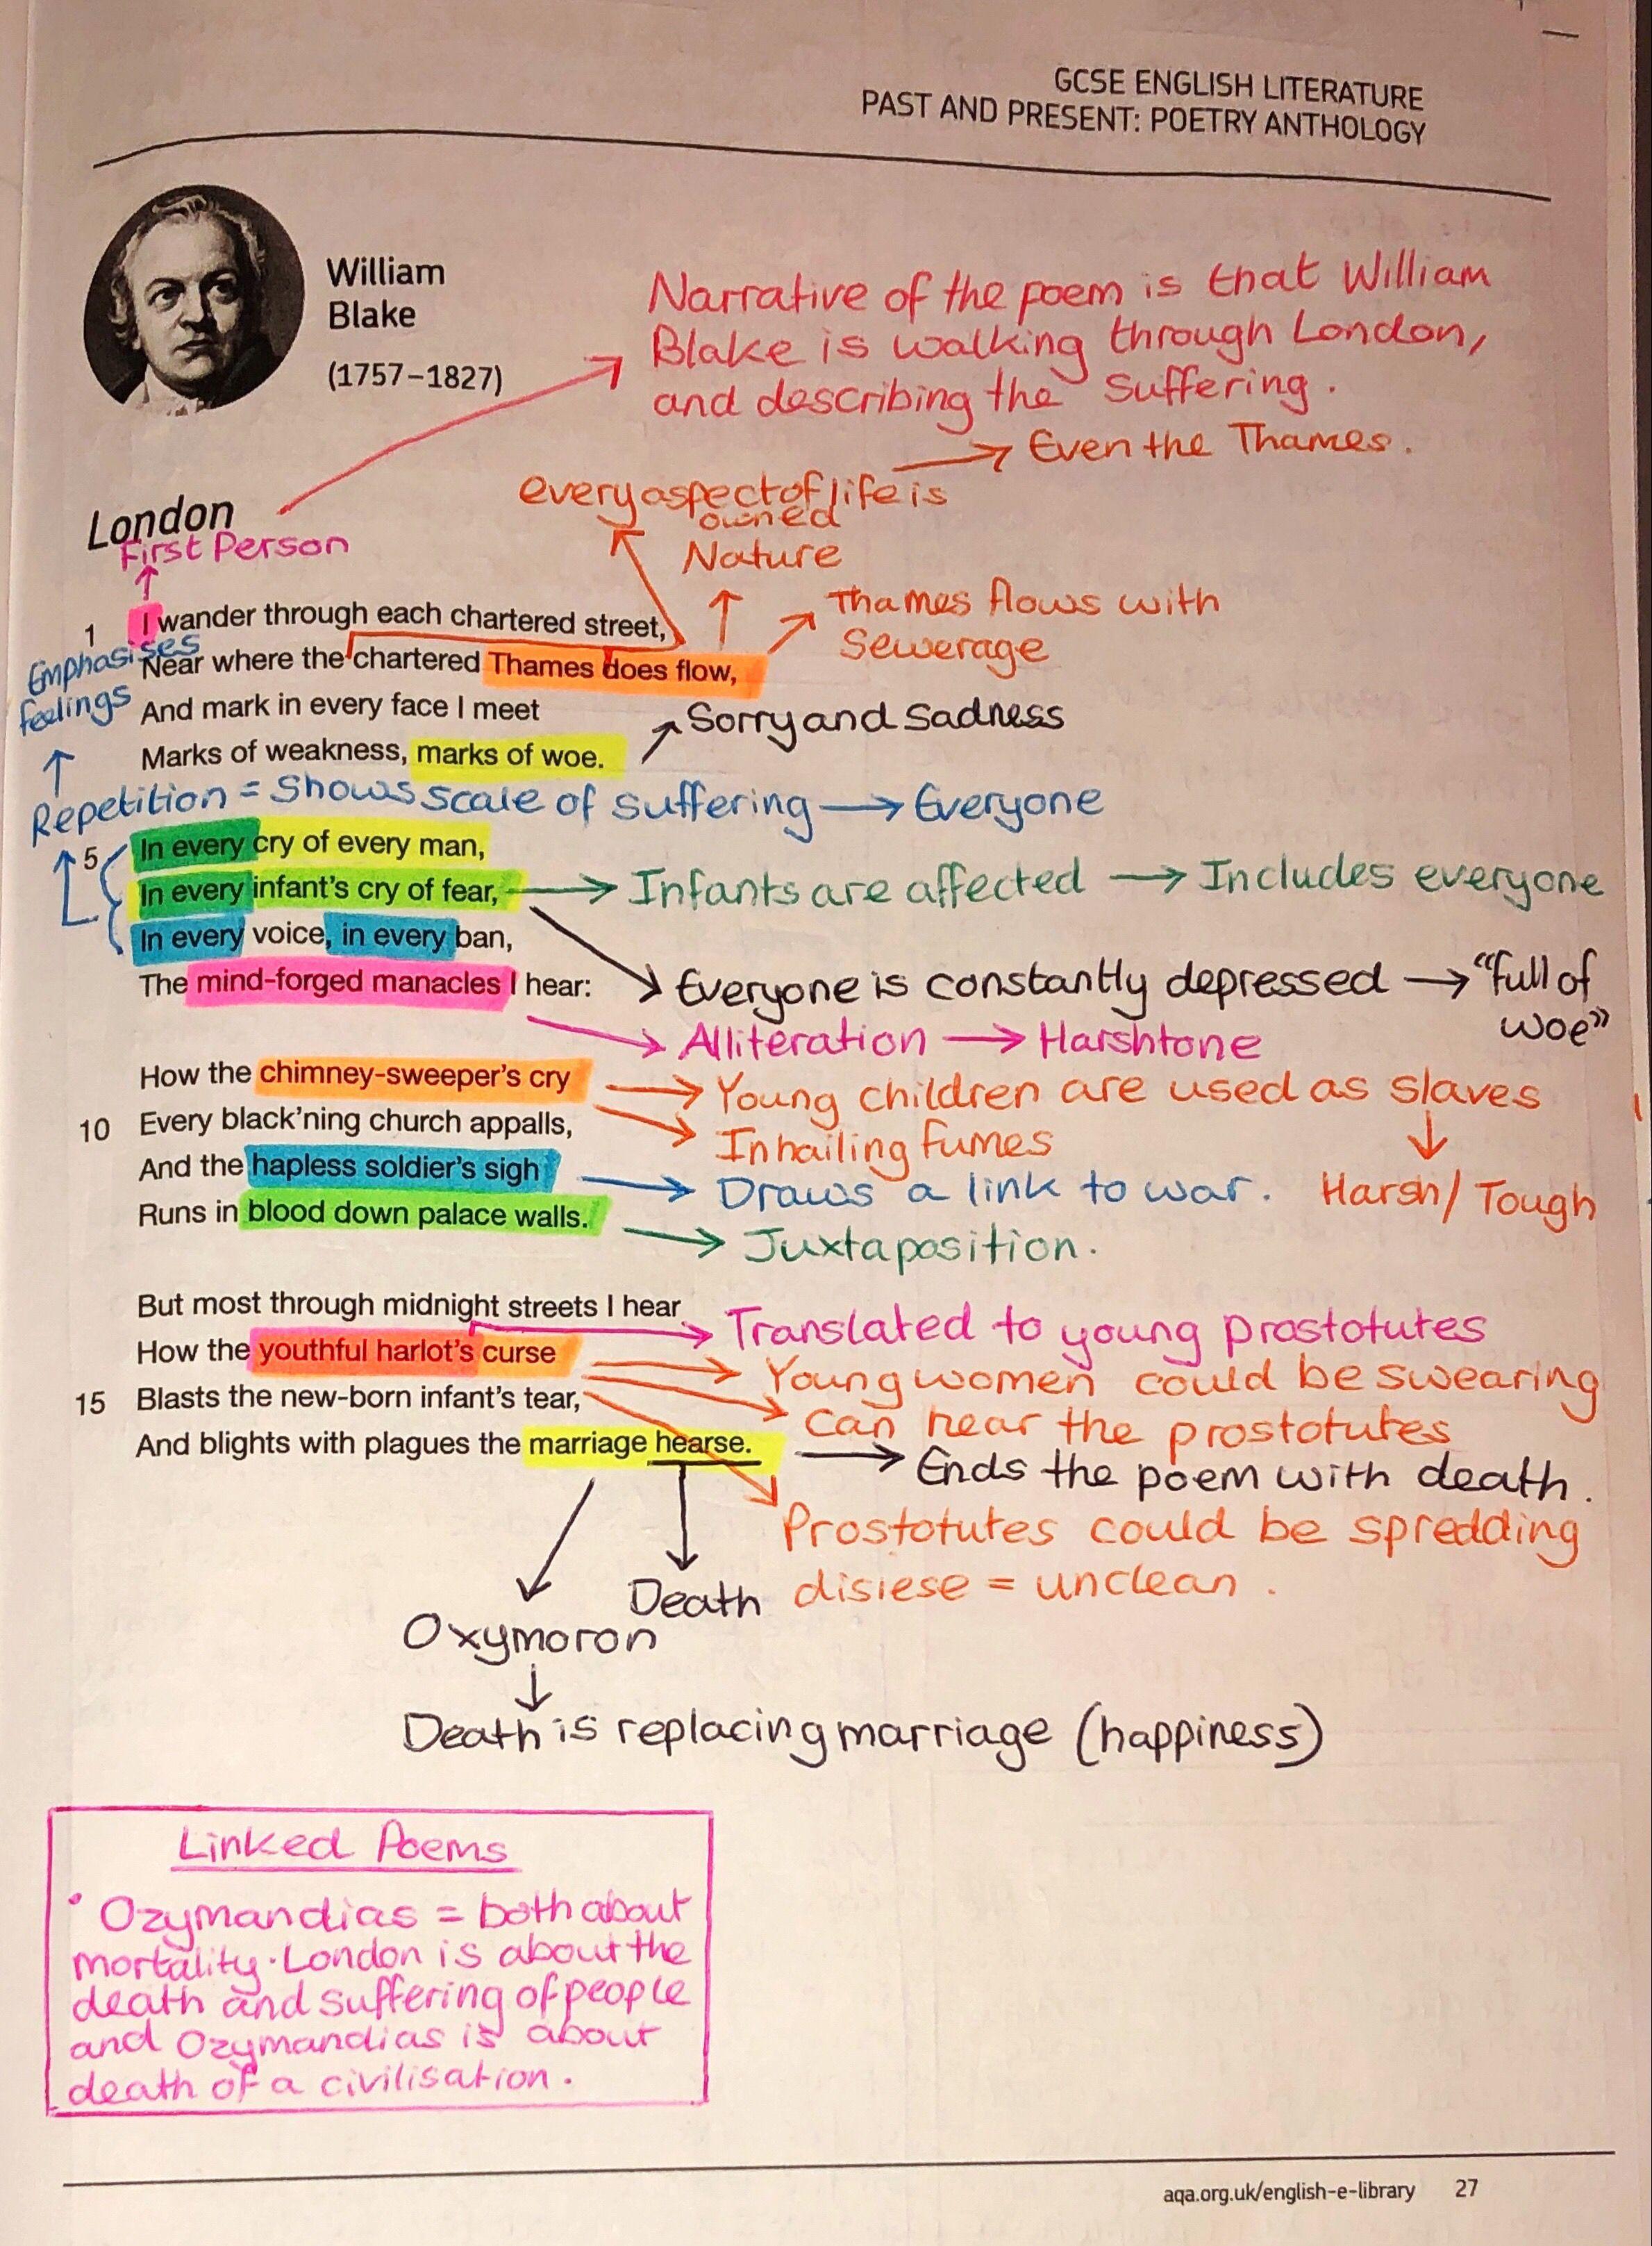 London Annotation Gcse English Literature Poem Revision Theme Of The Ozymandia By Pb Shelley